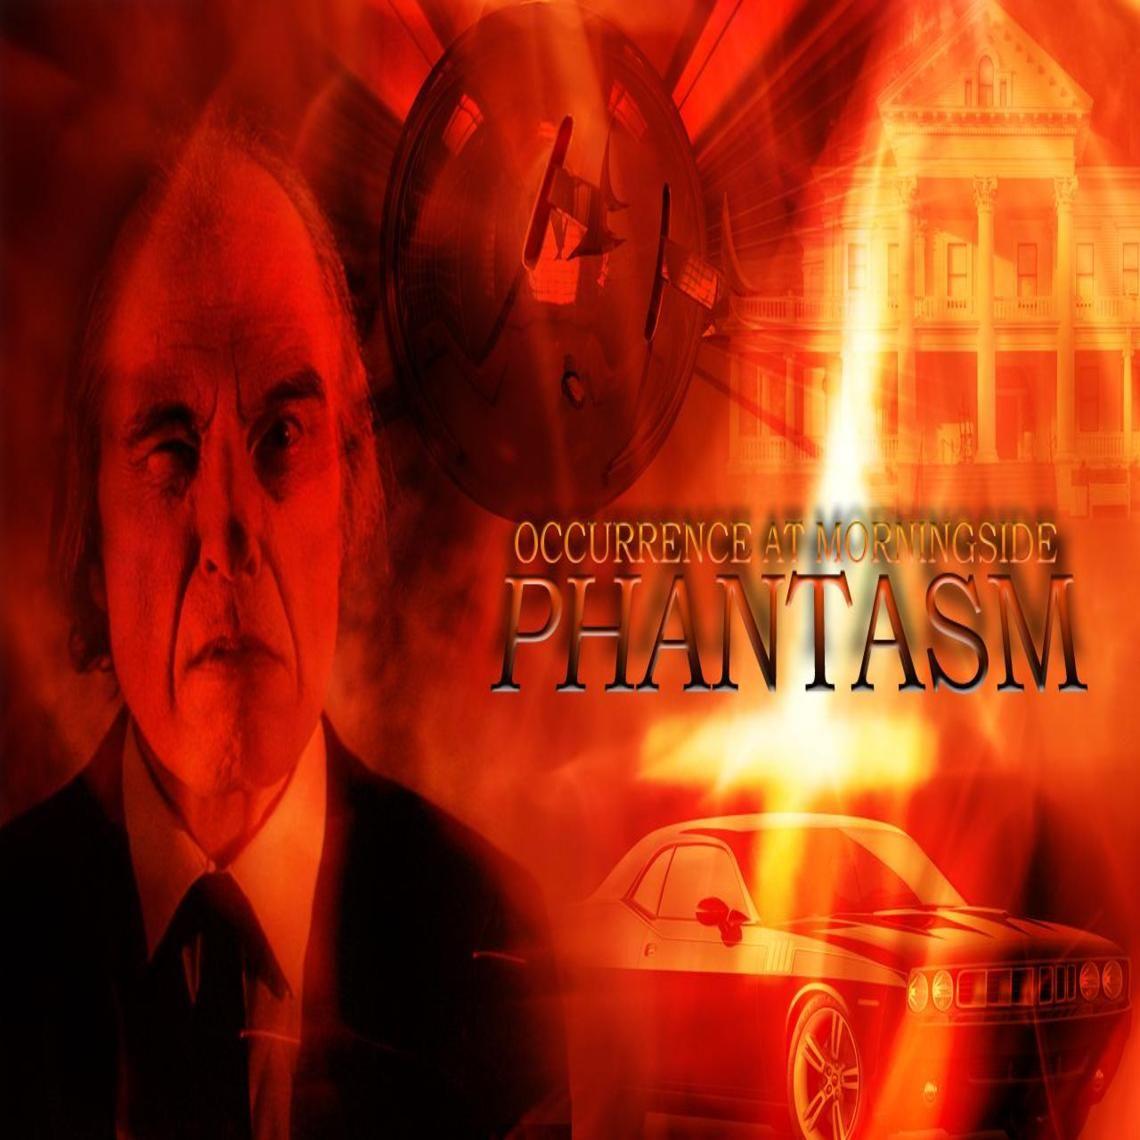 Phantasm - Occurrence at Morningside